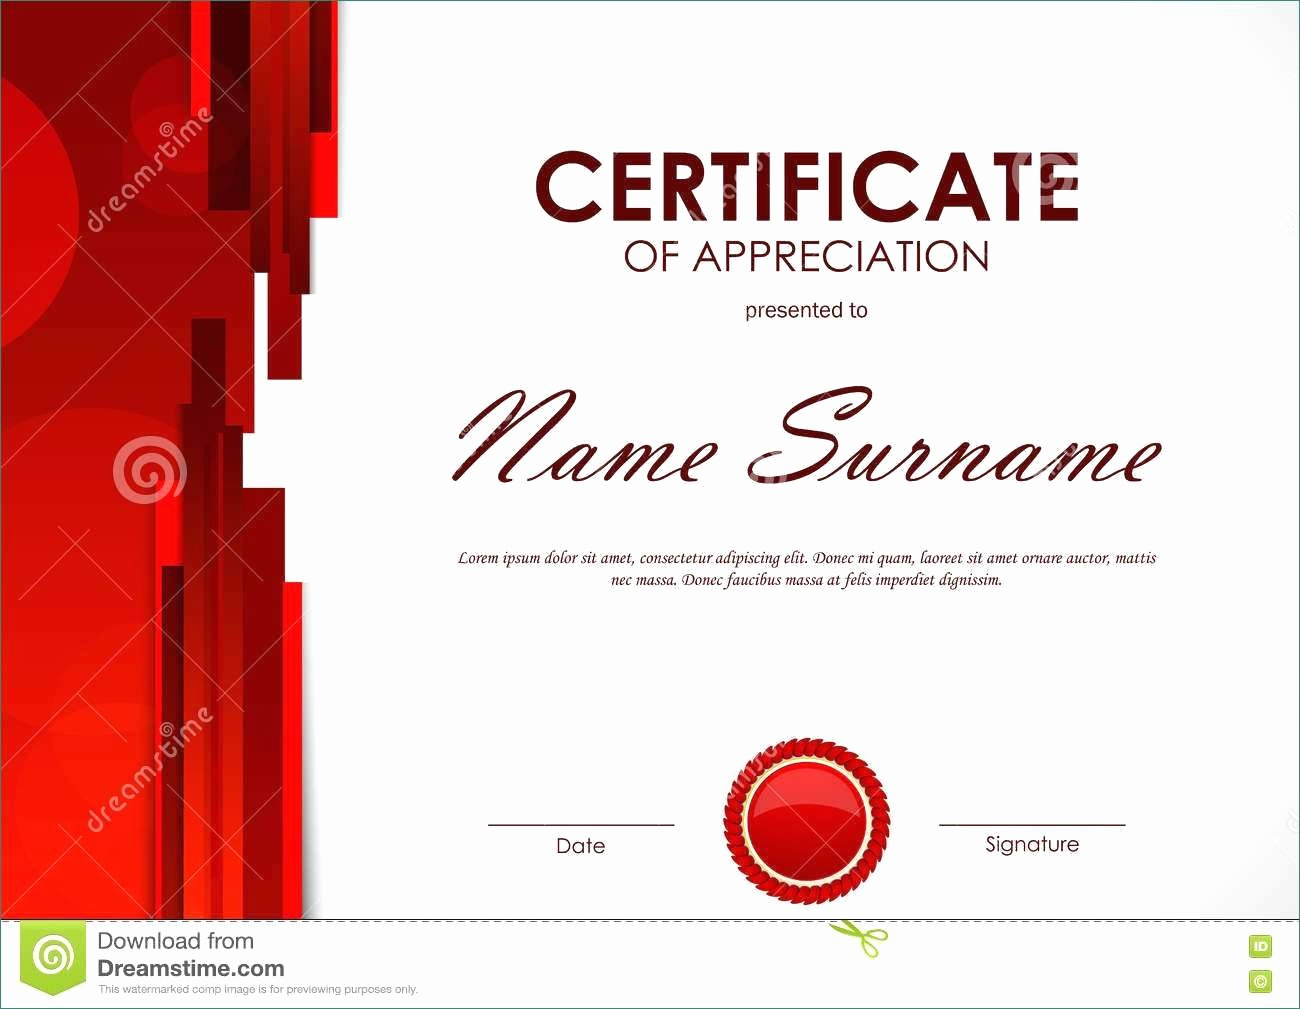 Free Download Certificate Of Appreciation Inspirational Impressive Free Download Certificate Appreciation